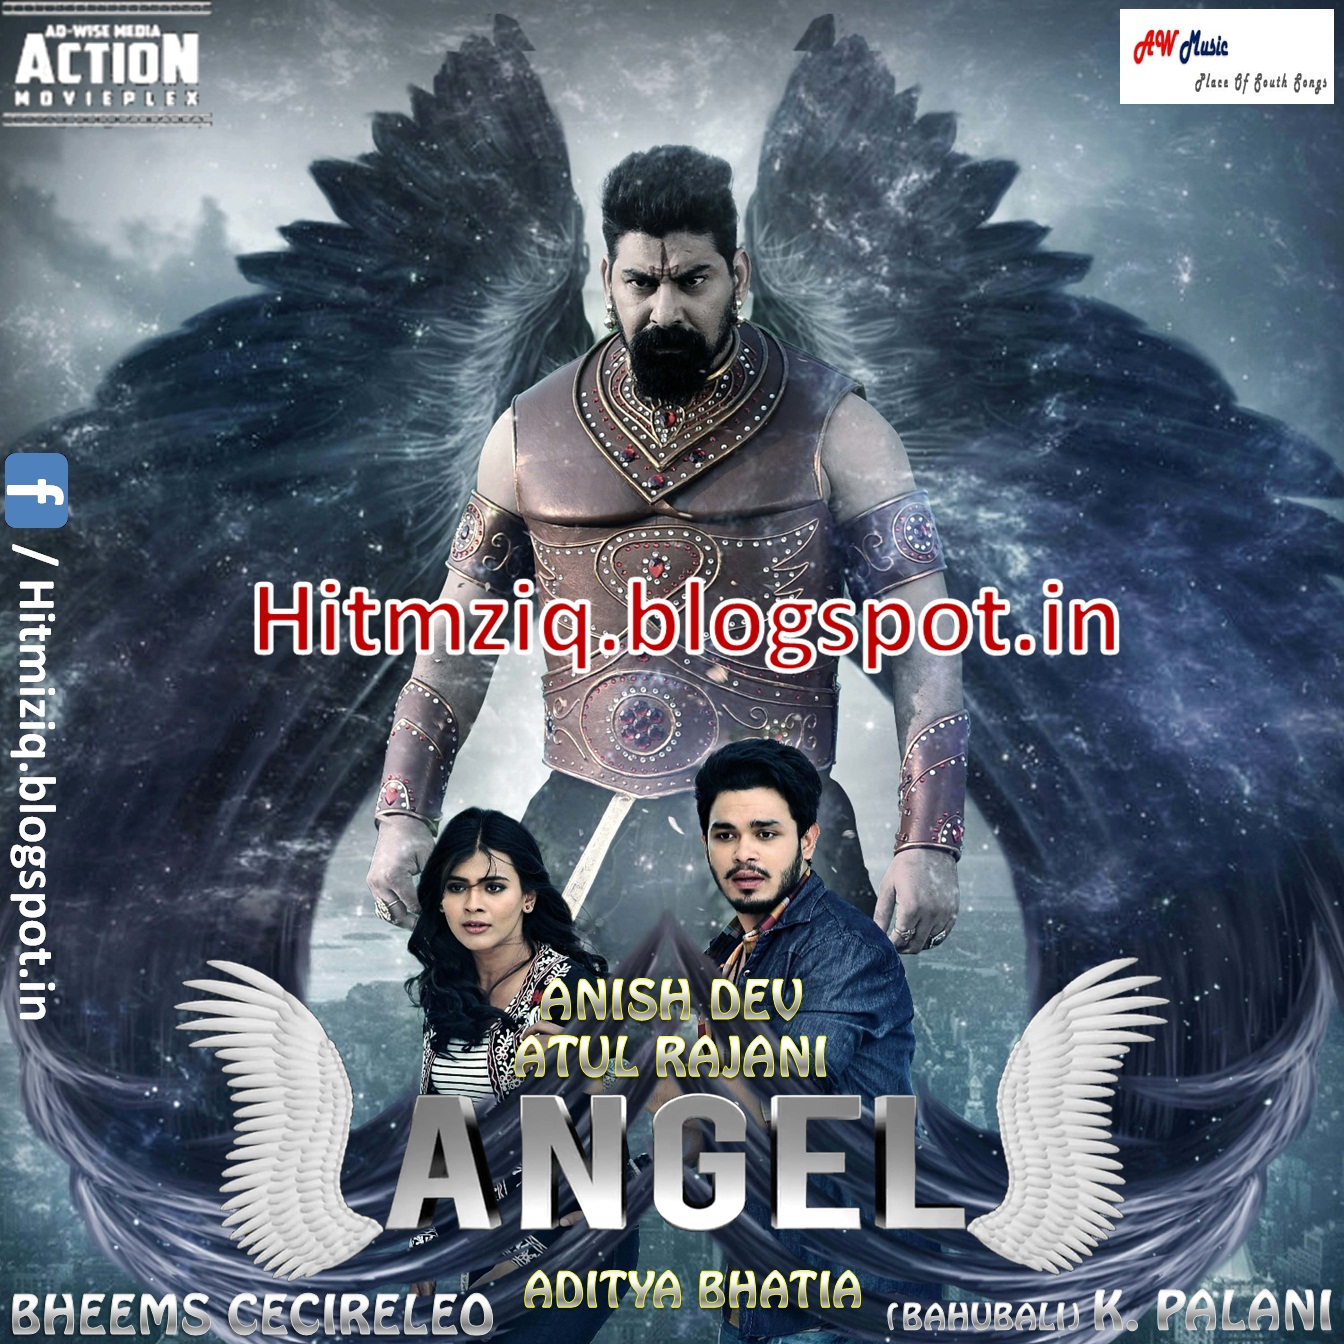 Angel (2018) Hindi Dubbed Songs - AW Music